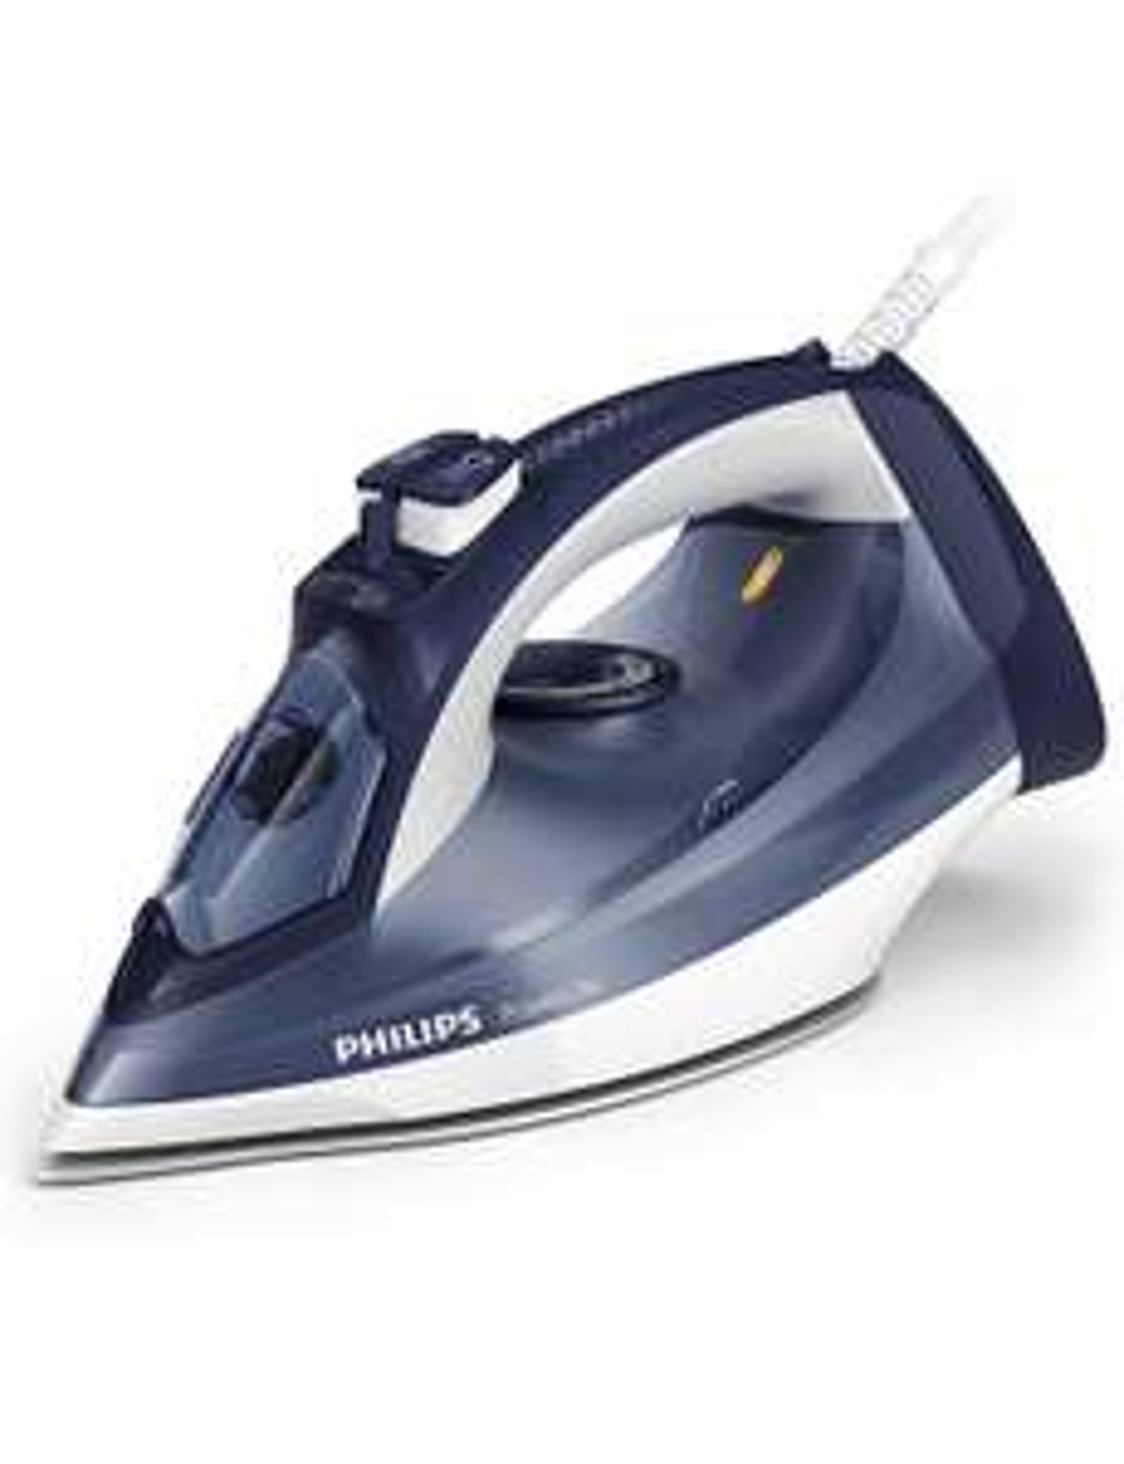 Fer à repasser Philips GC2994/20 - 2400 W